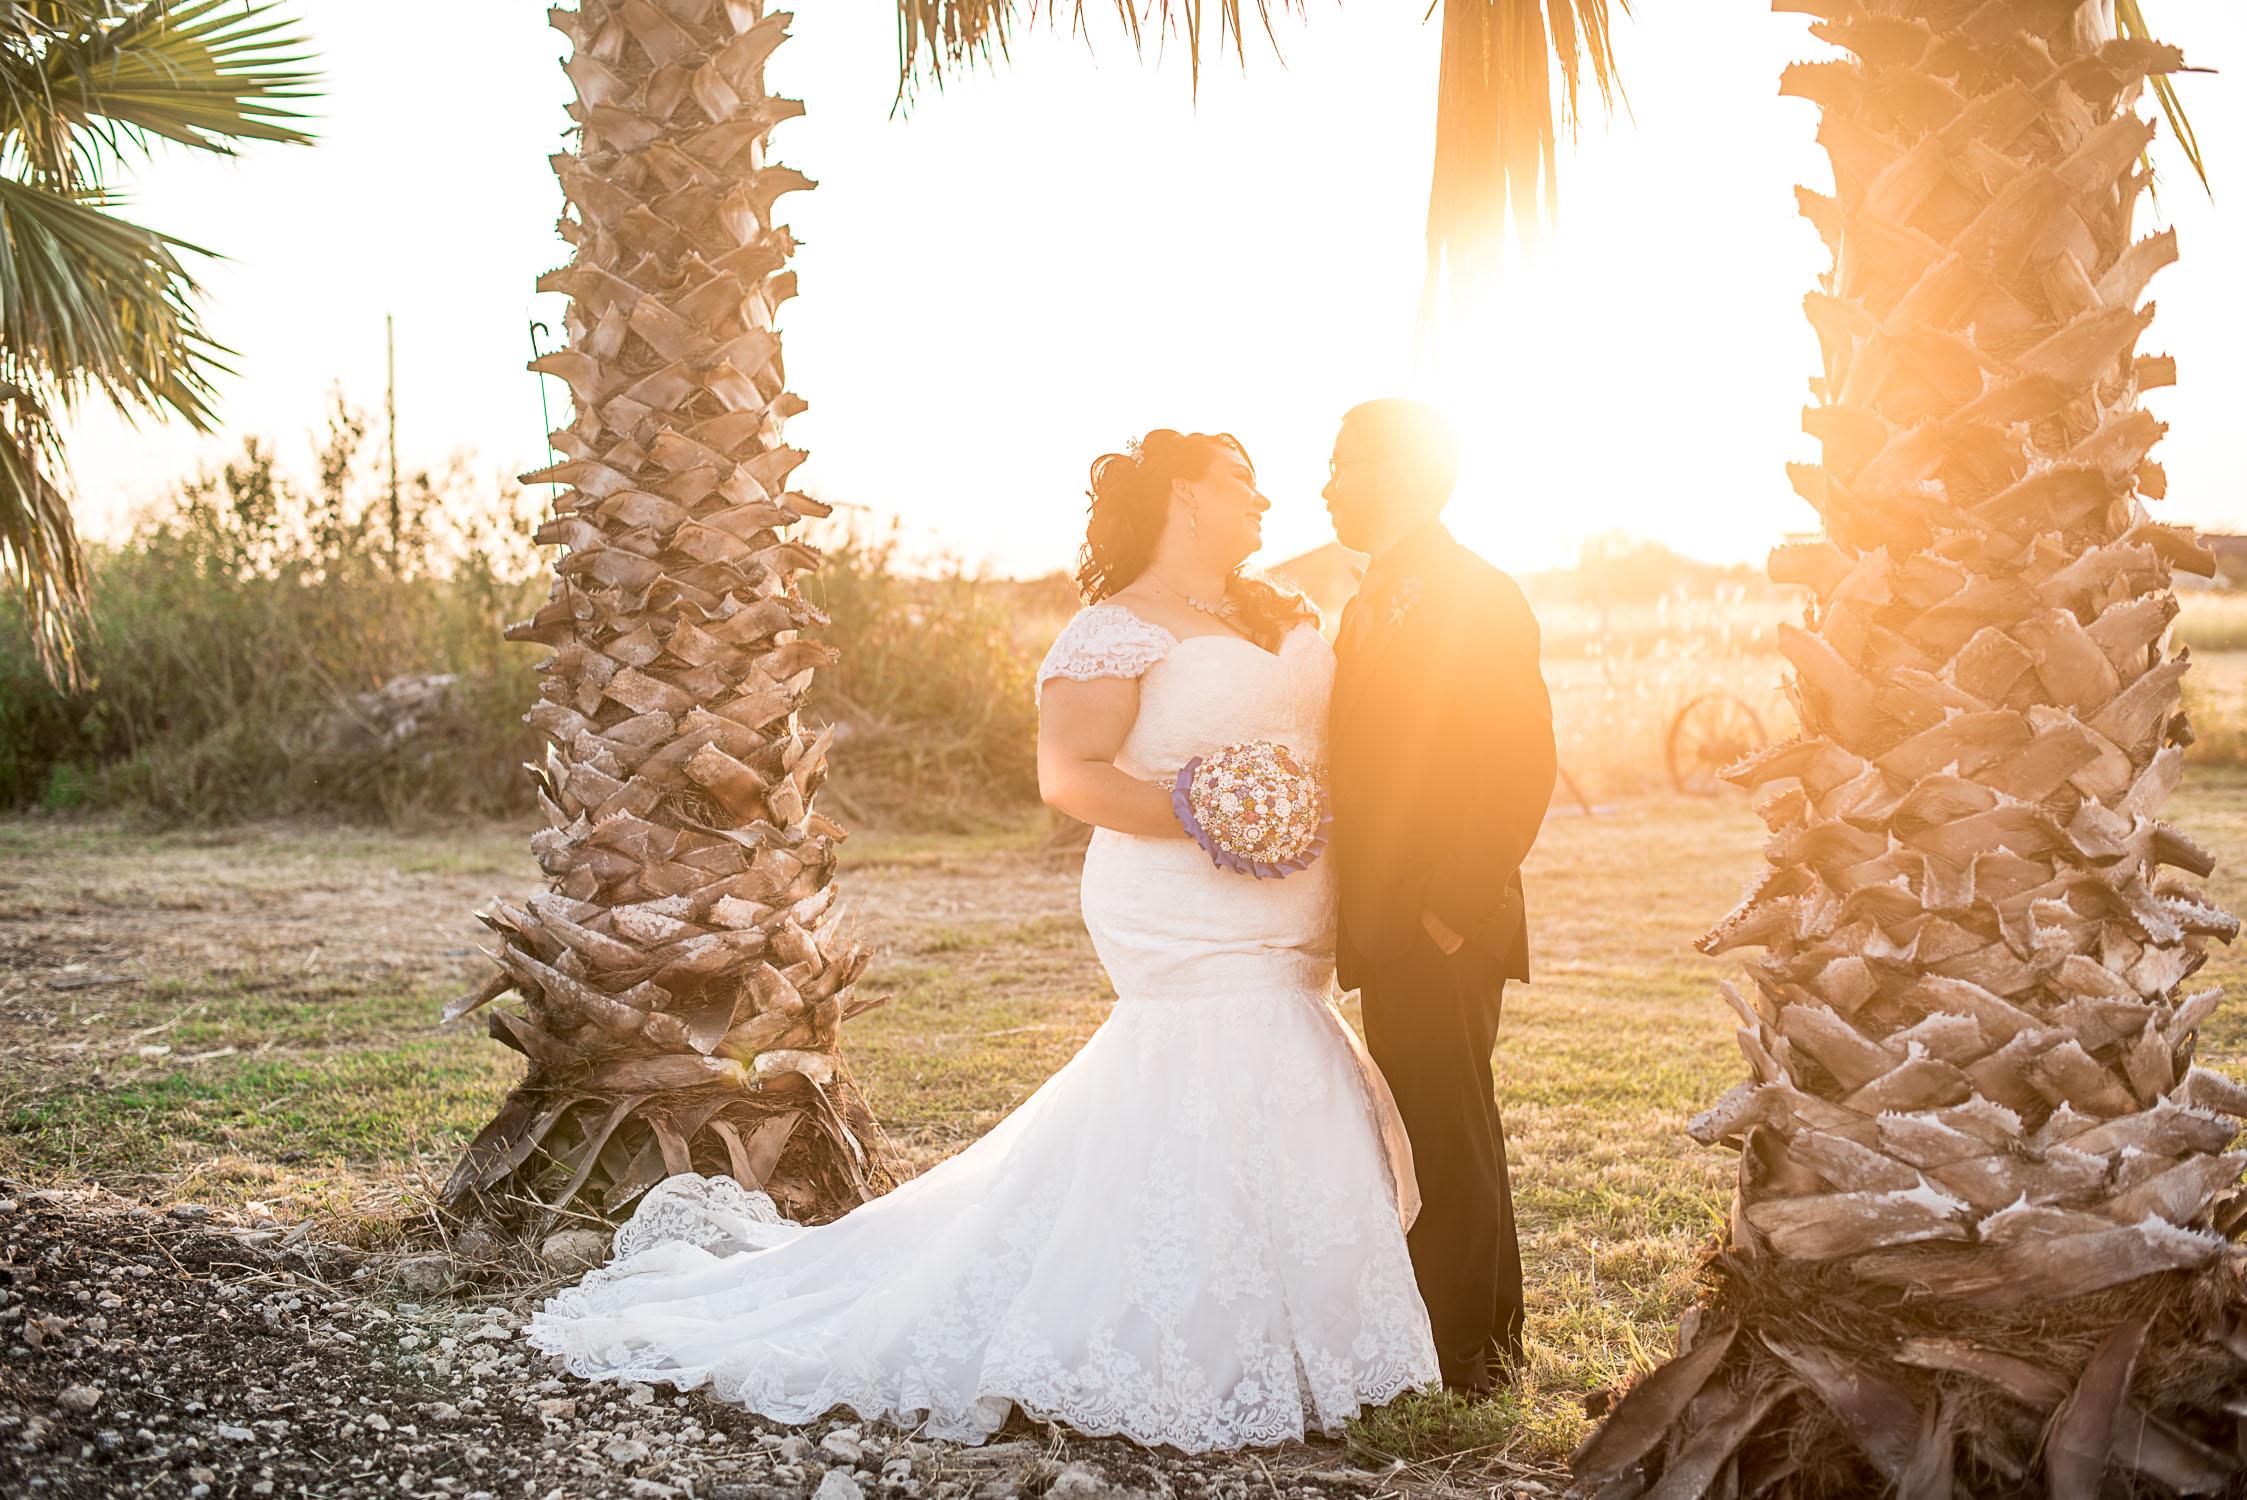 Leal Wedding Mira Visu Photography-131.jpg